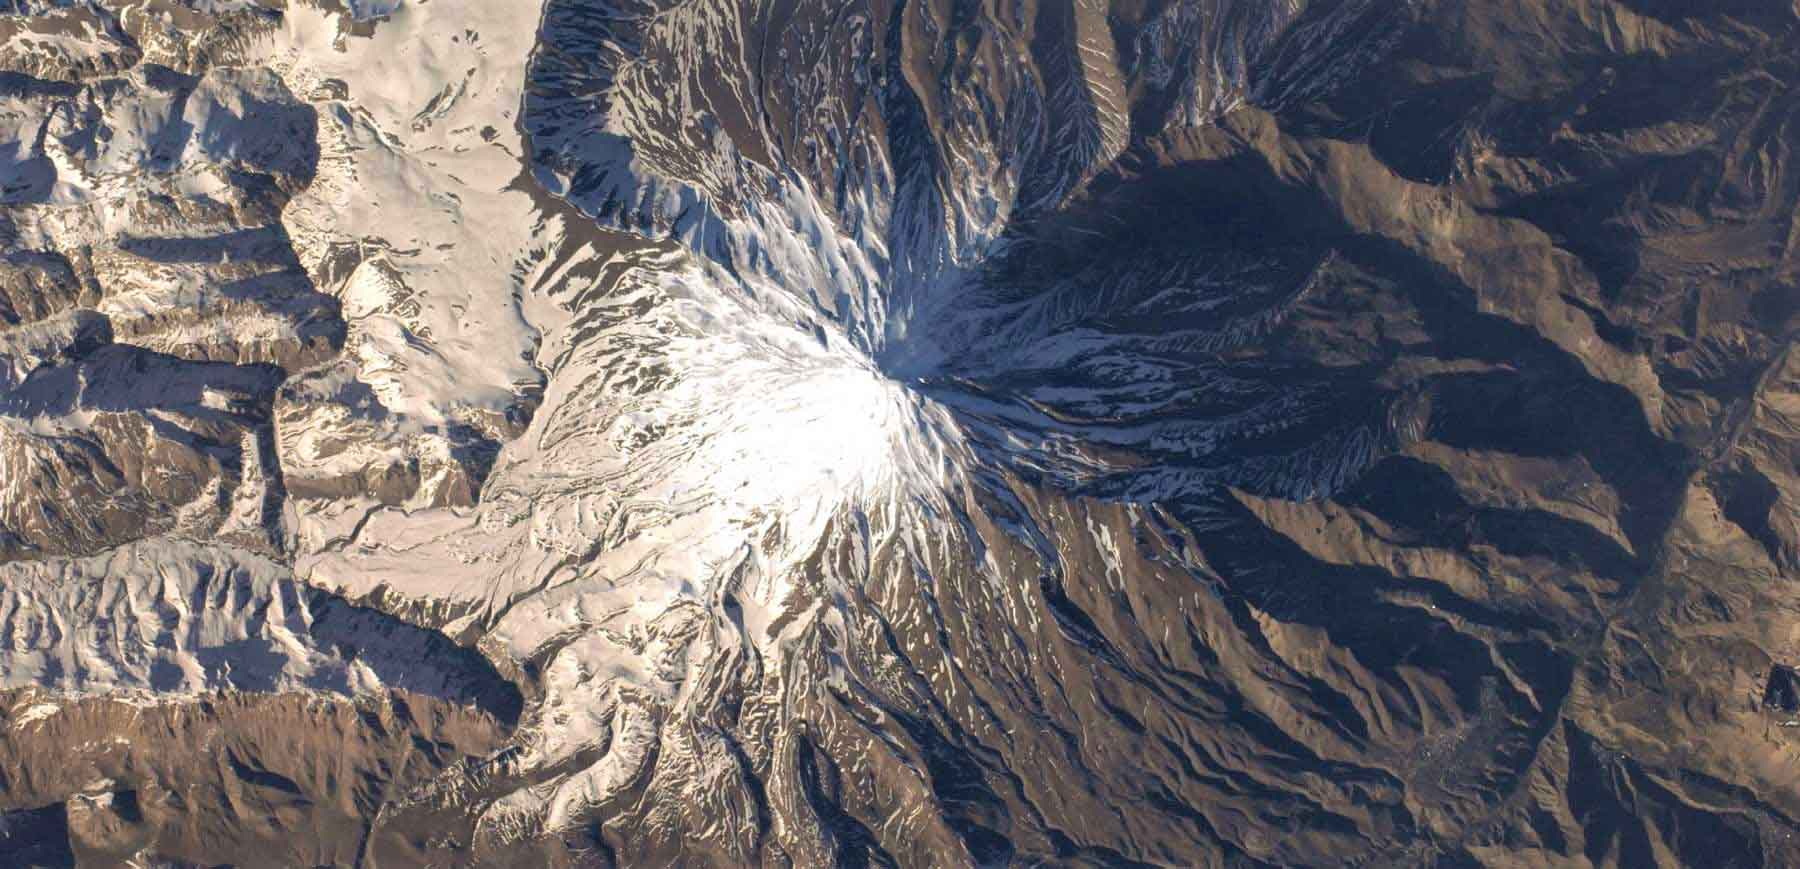 alibabatrek Damavand Volcanic crater Damavand magma mountain trekking iran blog -Iran-Tour